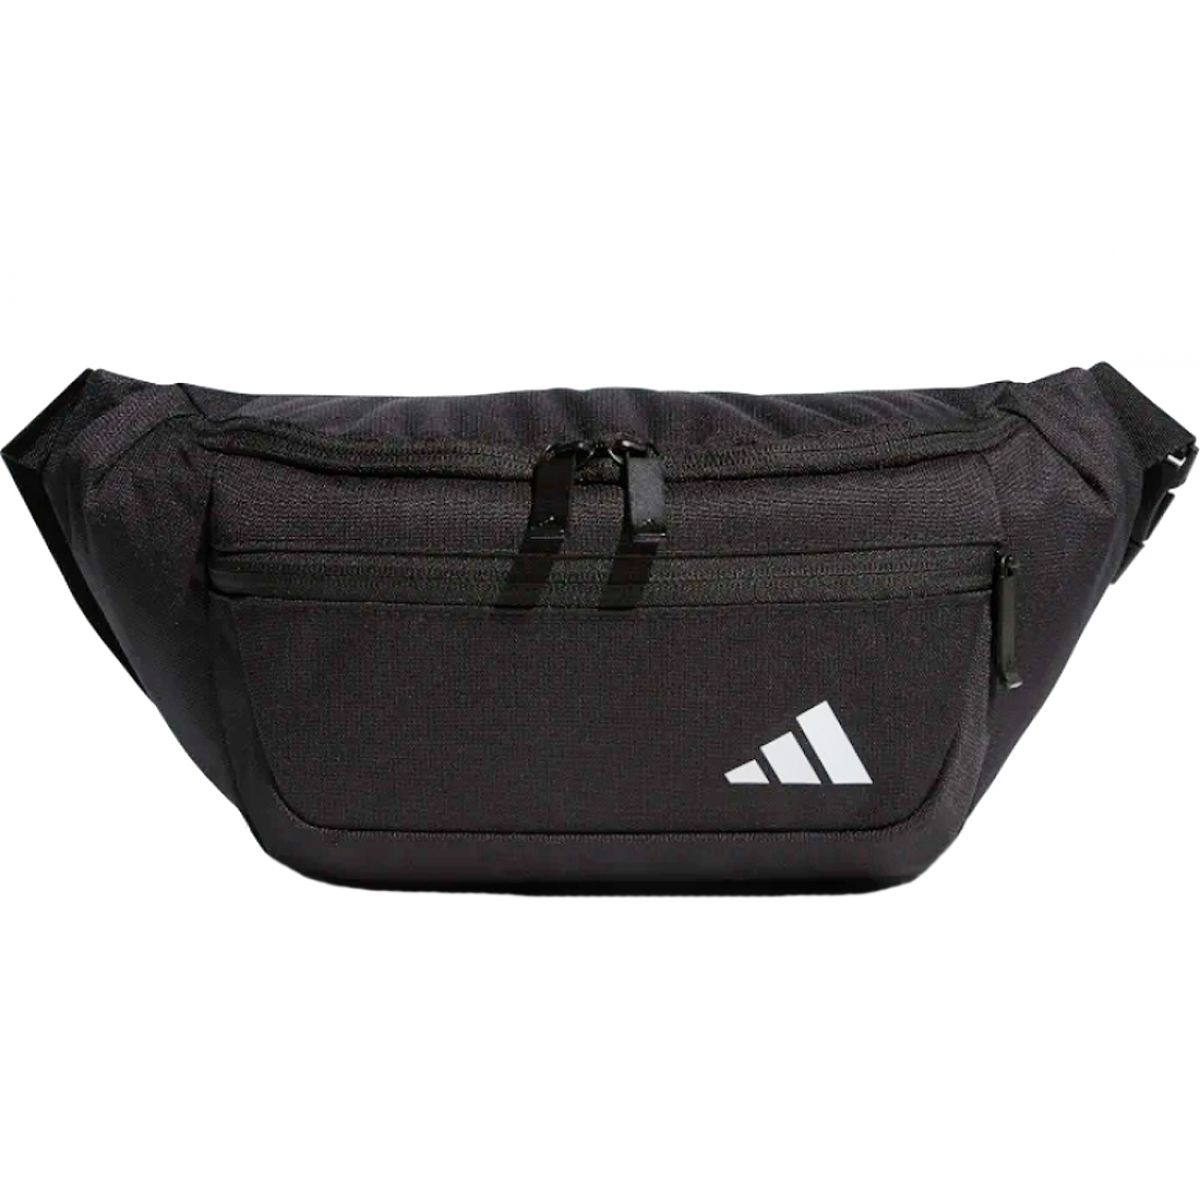 Adidas Urban Waist Bag